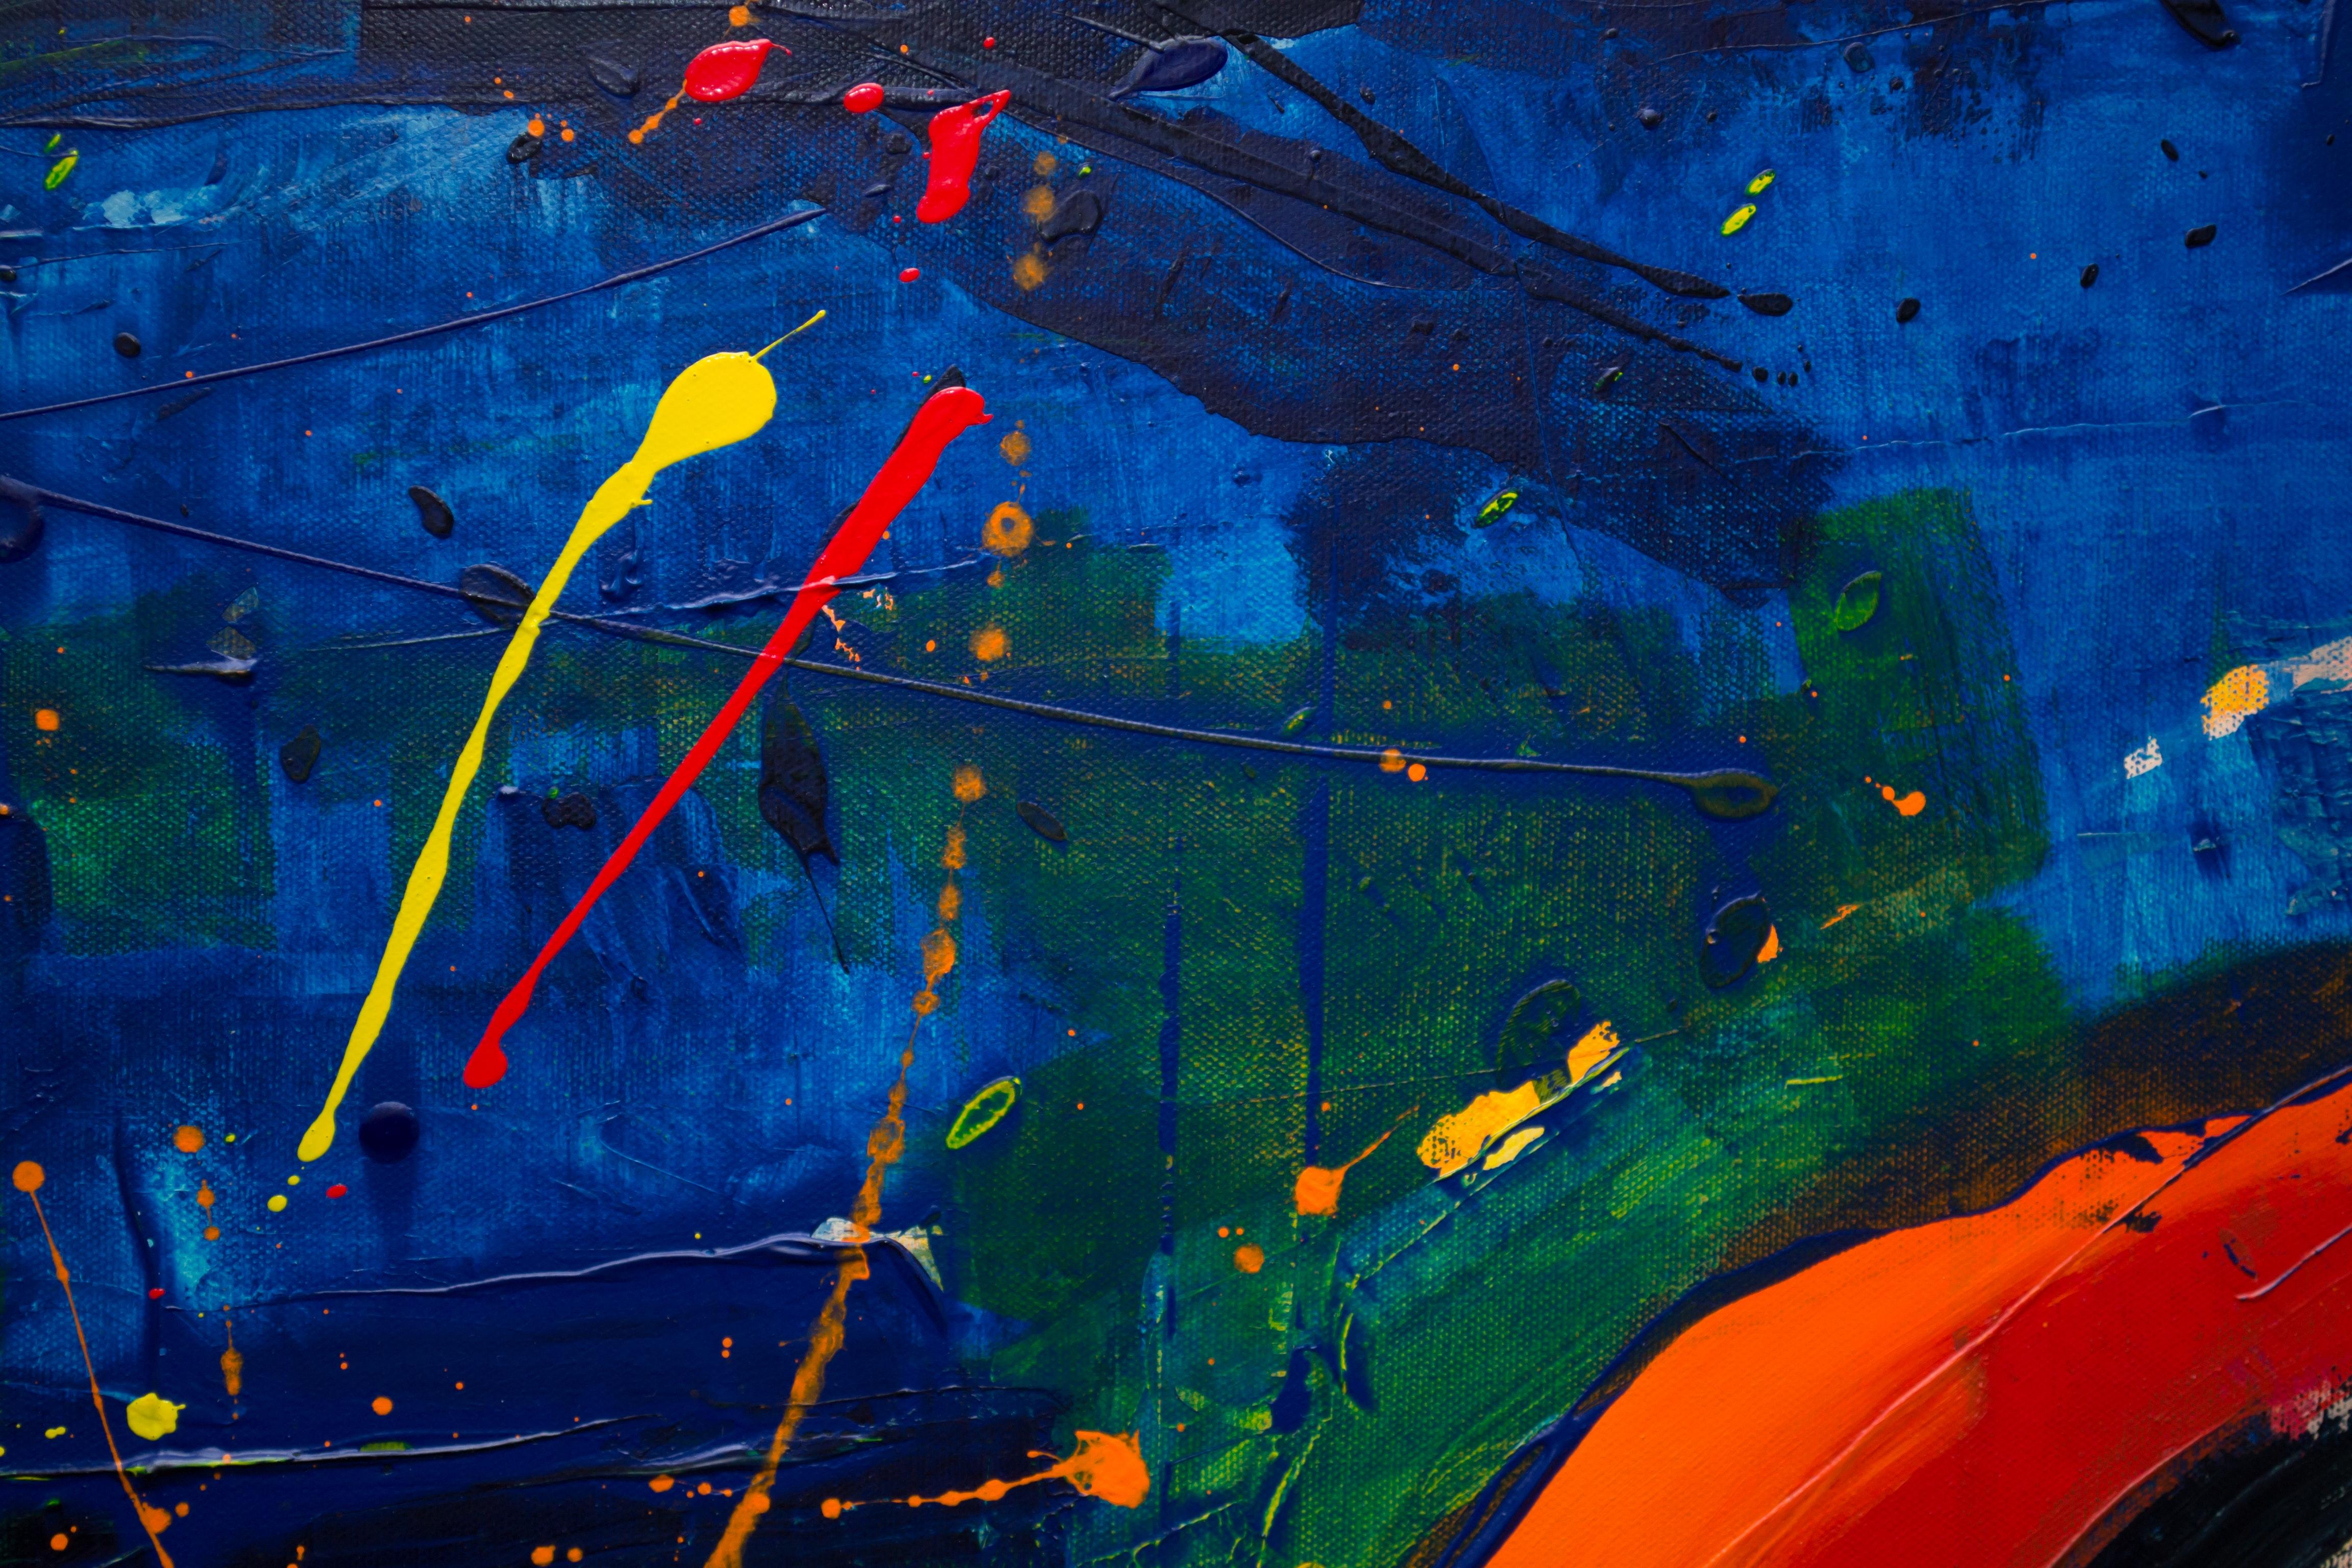 Painting Wall Abstract 5k, HD Abstract, 4k Wallpapers ...